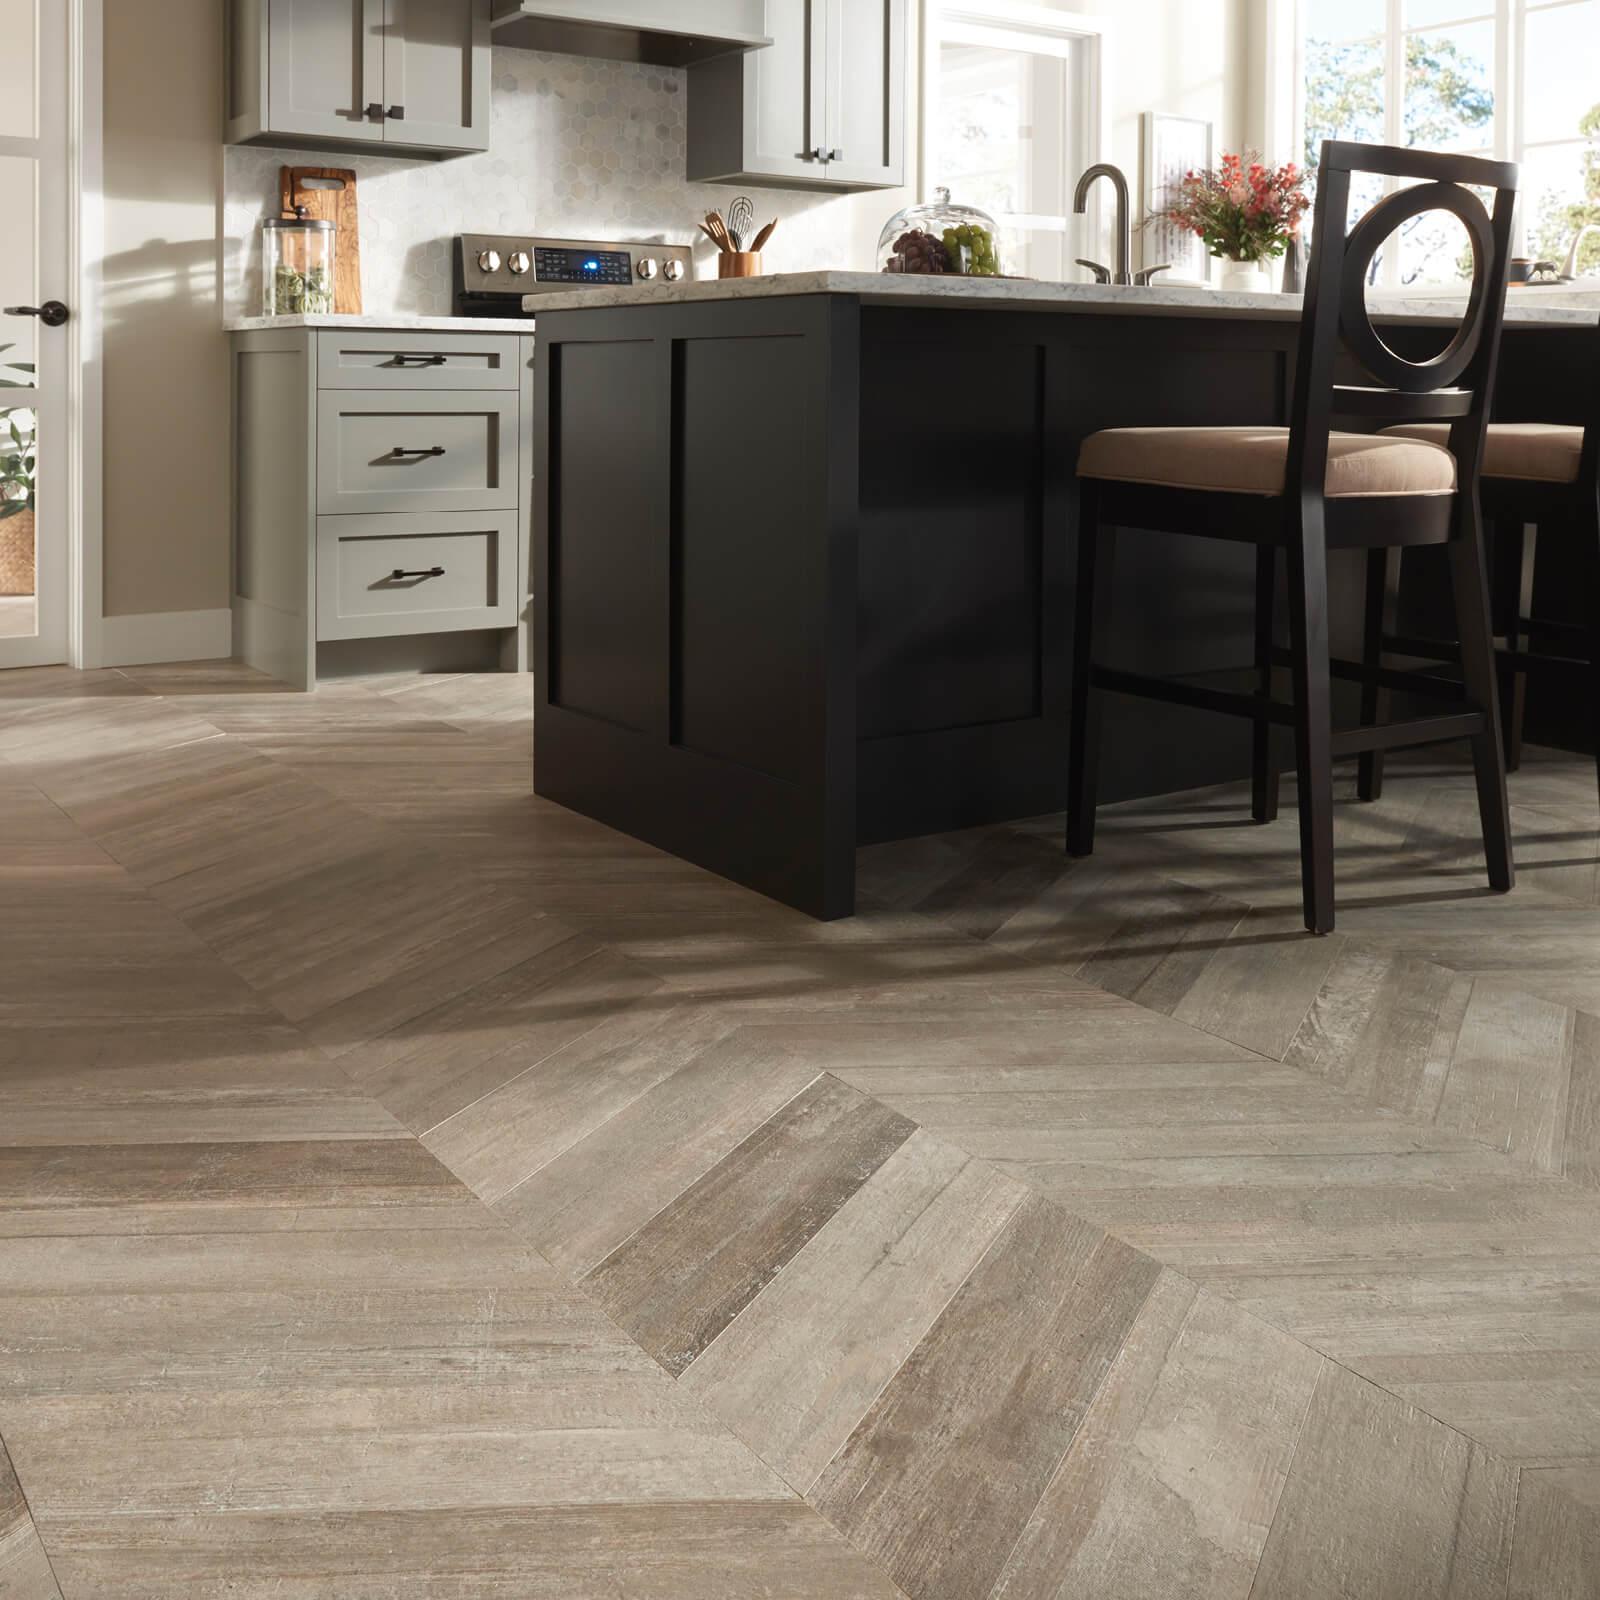 Glee chevron tile flooring | Great Floors